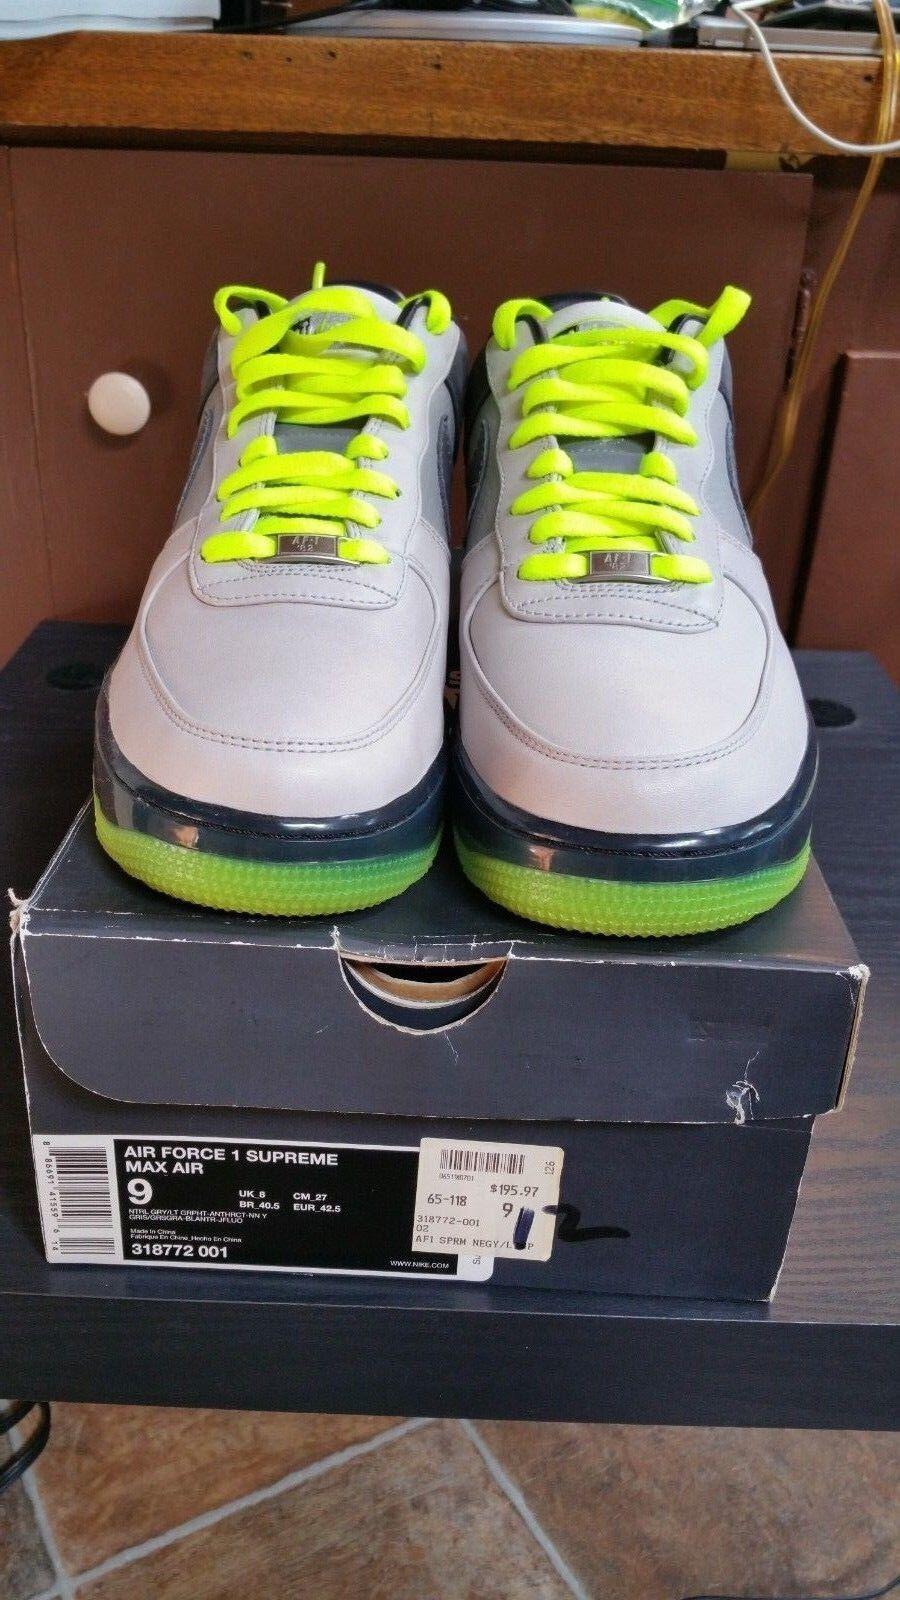 Men's Nike Airforce 1 AF1 supreme max air 318772-001 size 9 sprm Special limited time